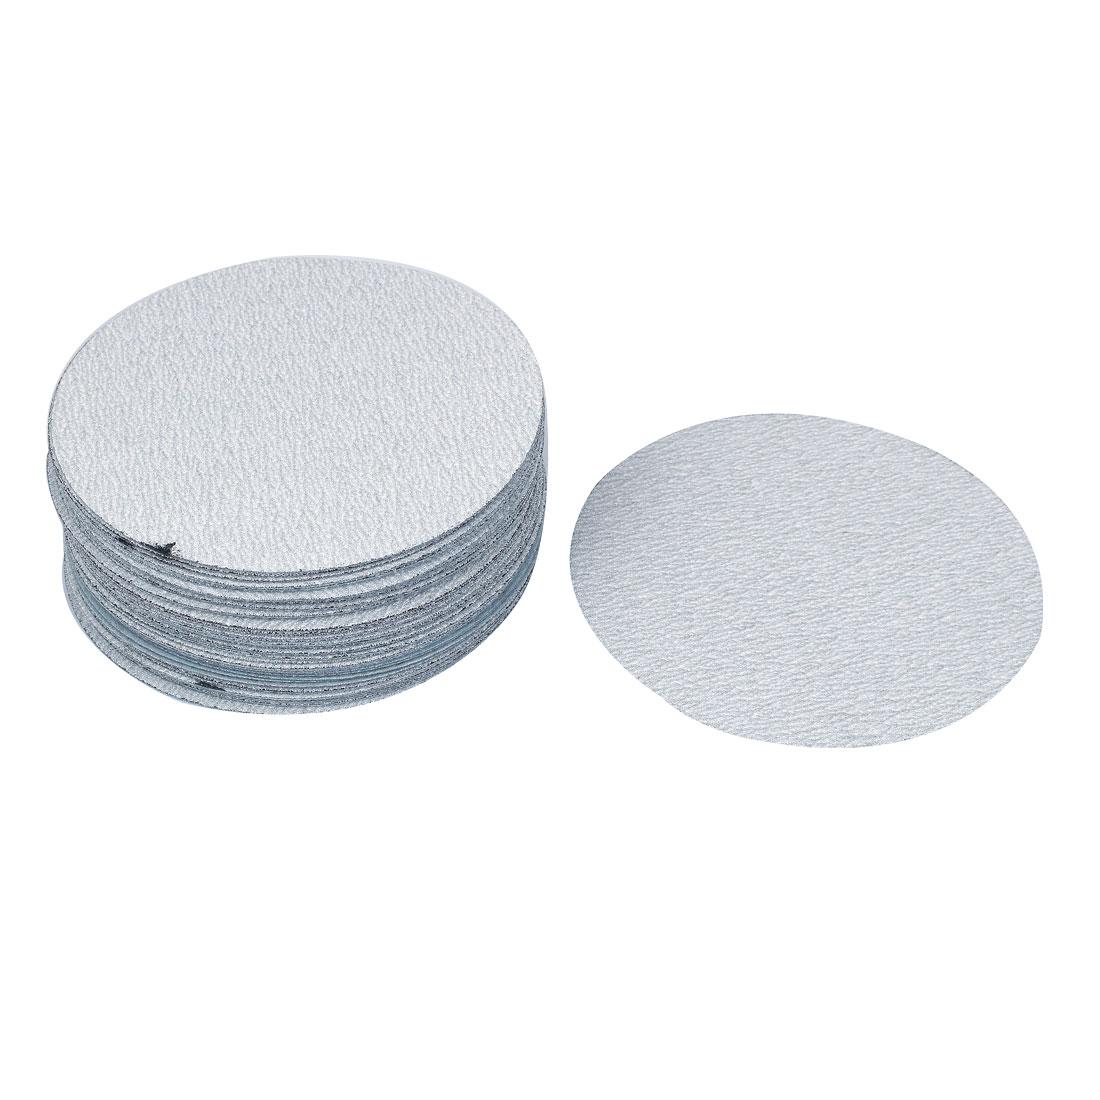 "6"" Dia Polishing Round Dry Abrasive Sanding Sandpaper Sheet Disc 180 Grit 50pcs"